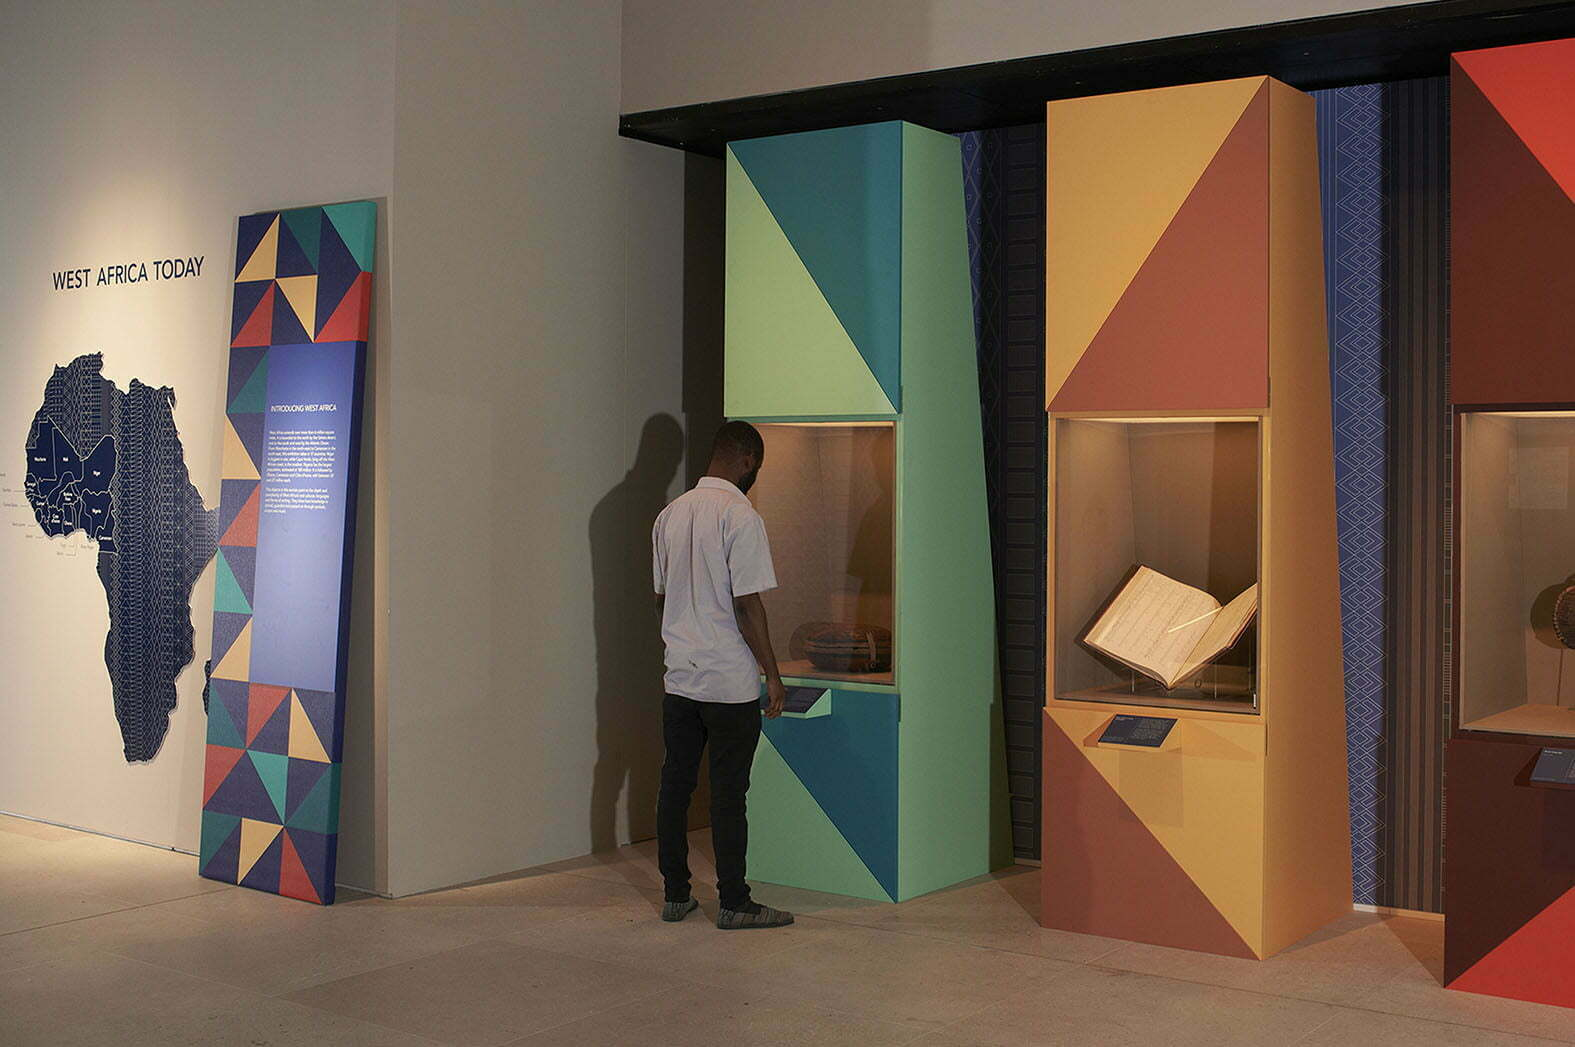 02_Lombaert_Studio_British_Library_West_Africa_06